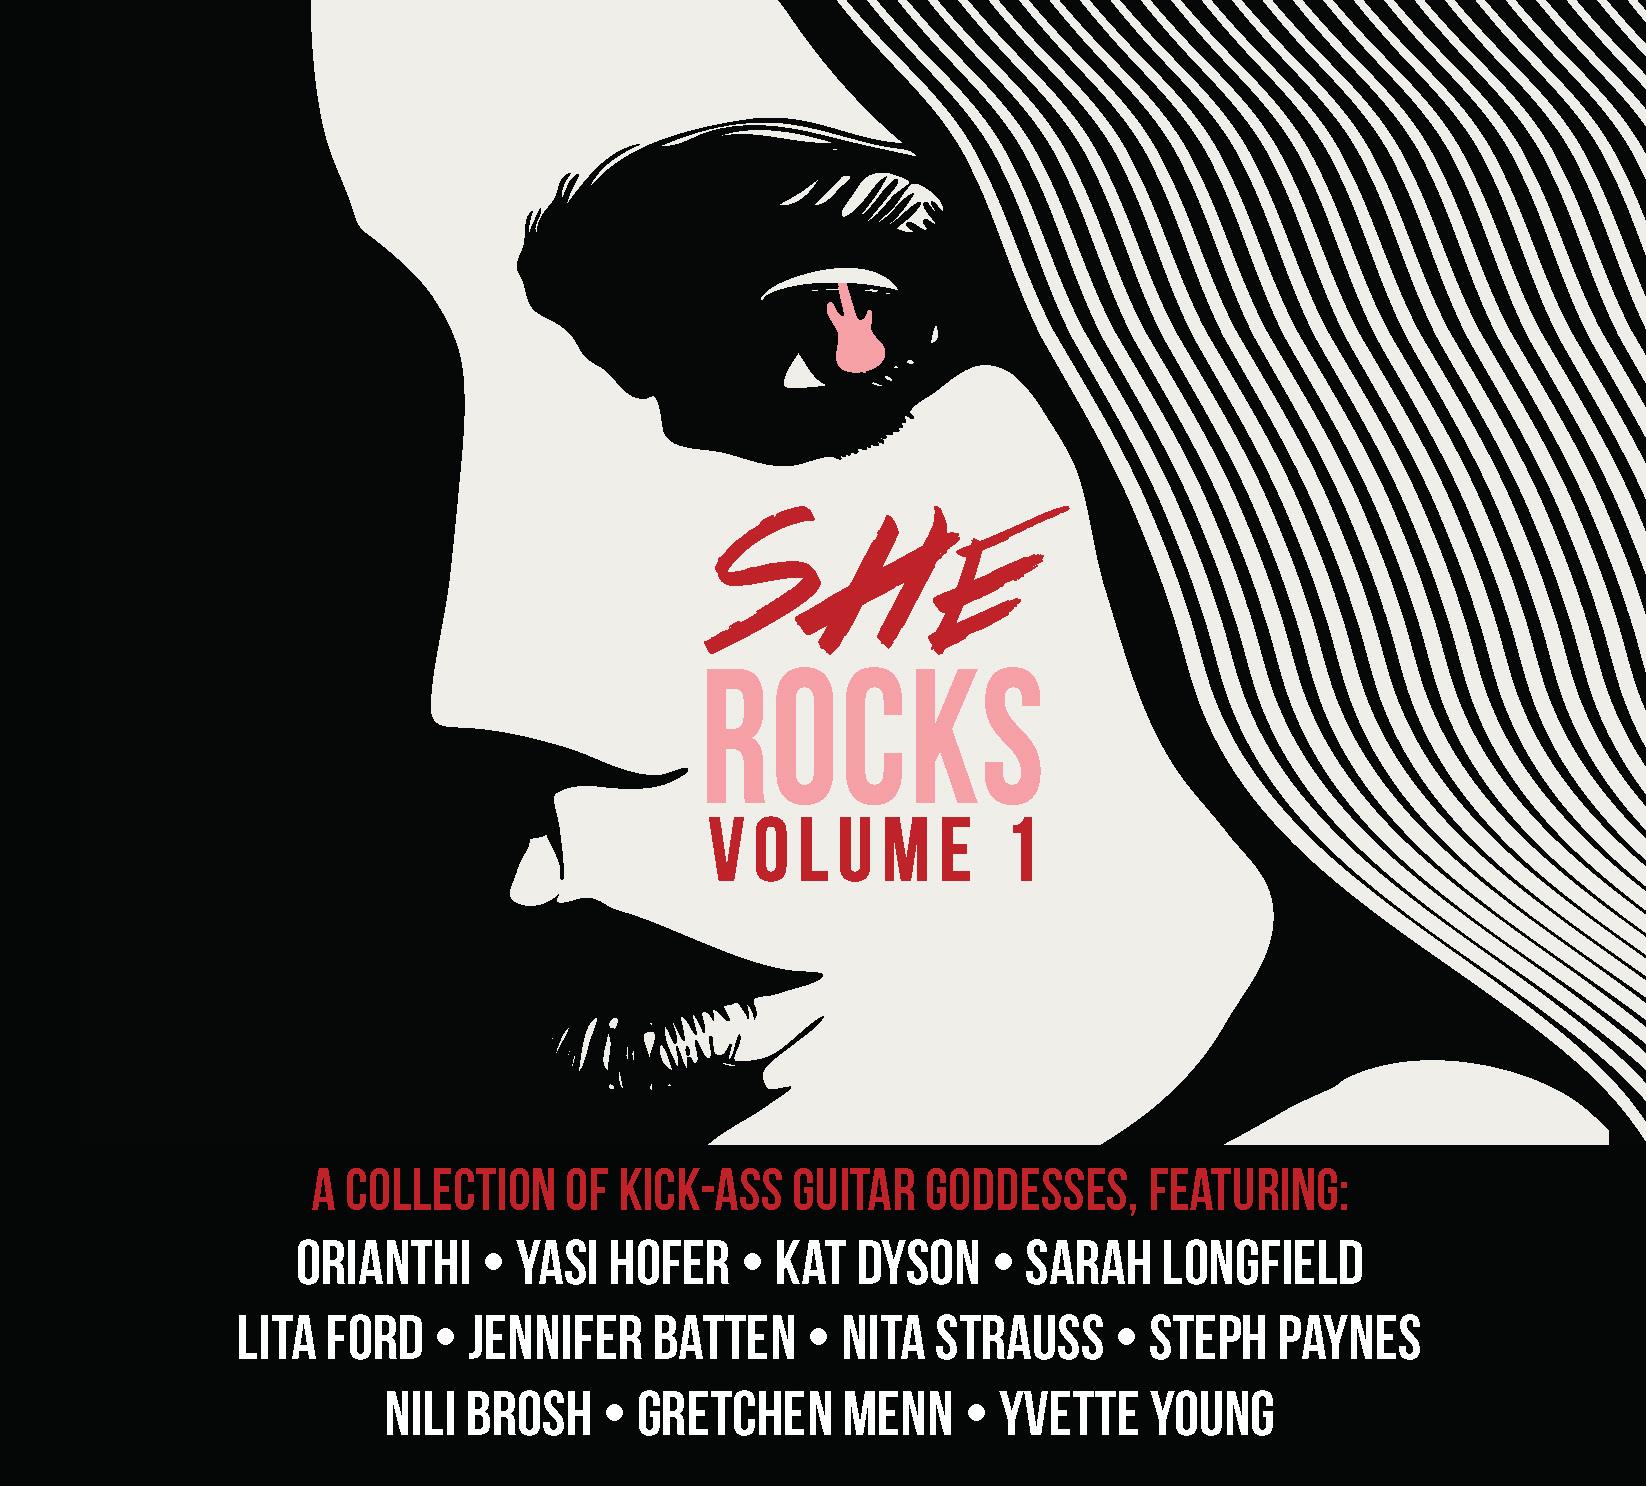 she-rocks-vol-1-cover-image